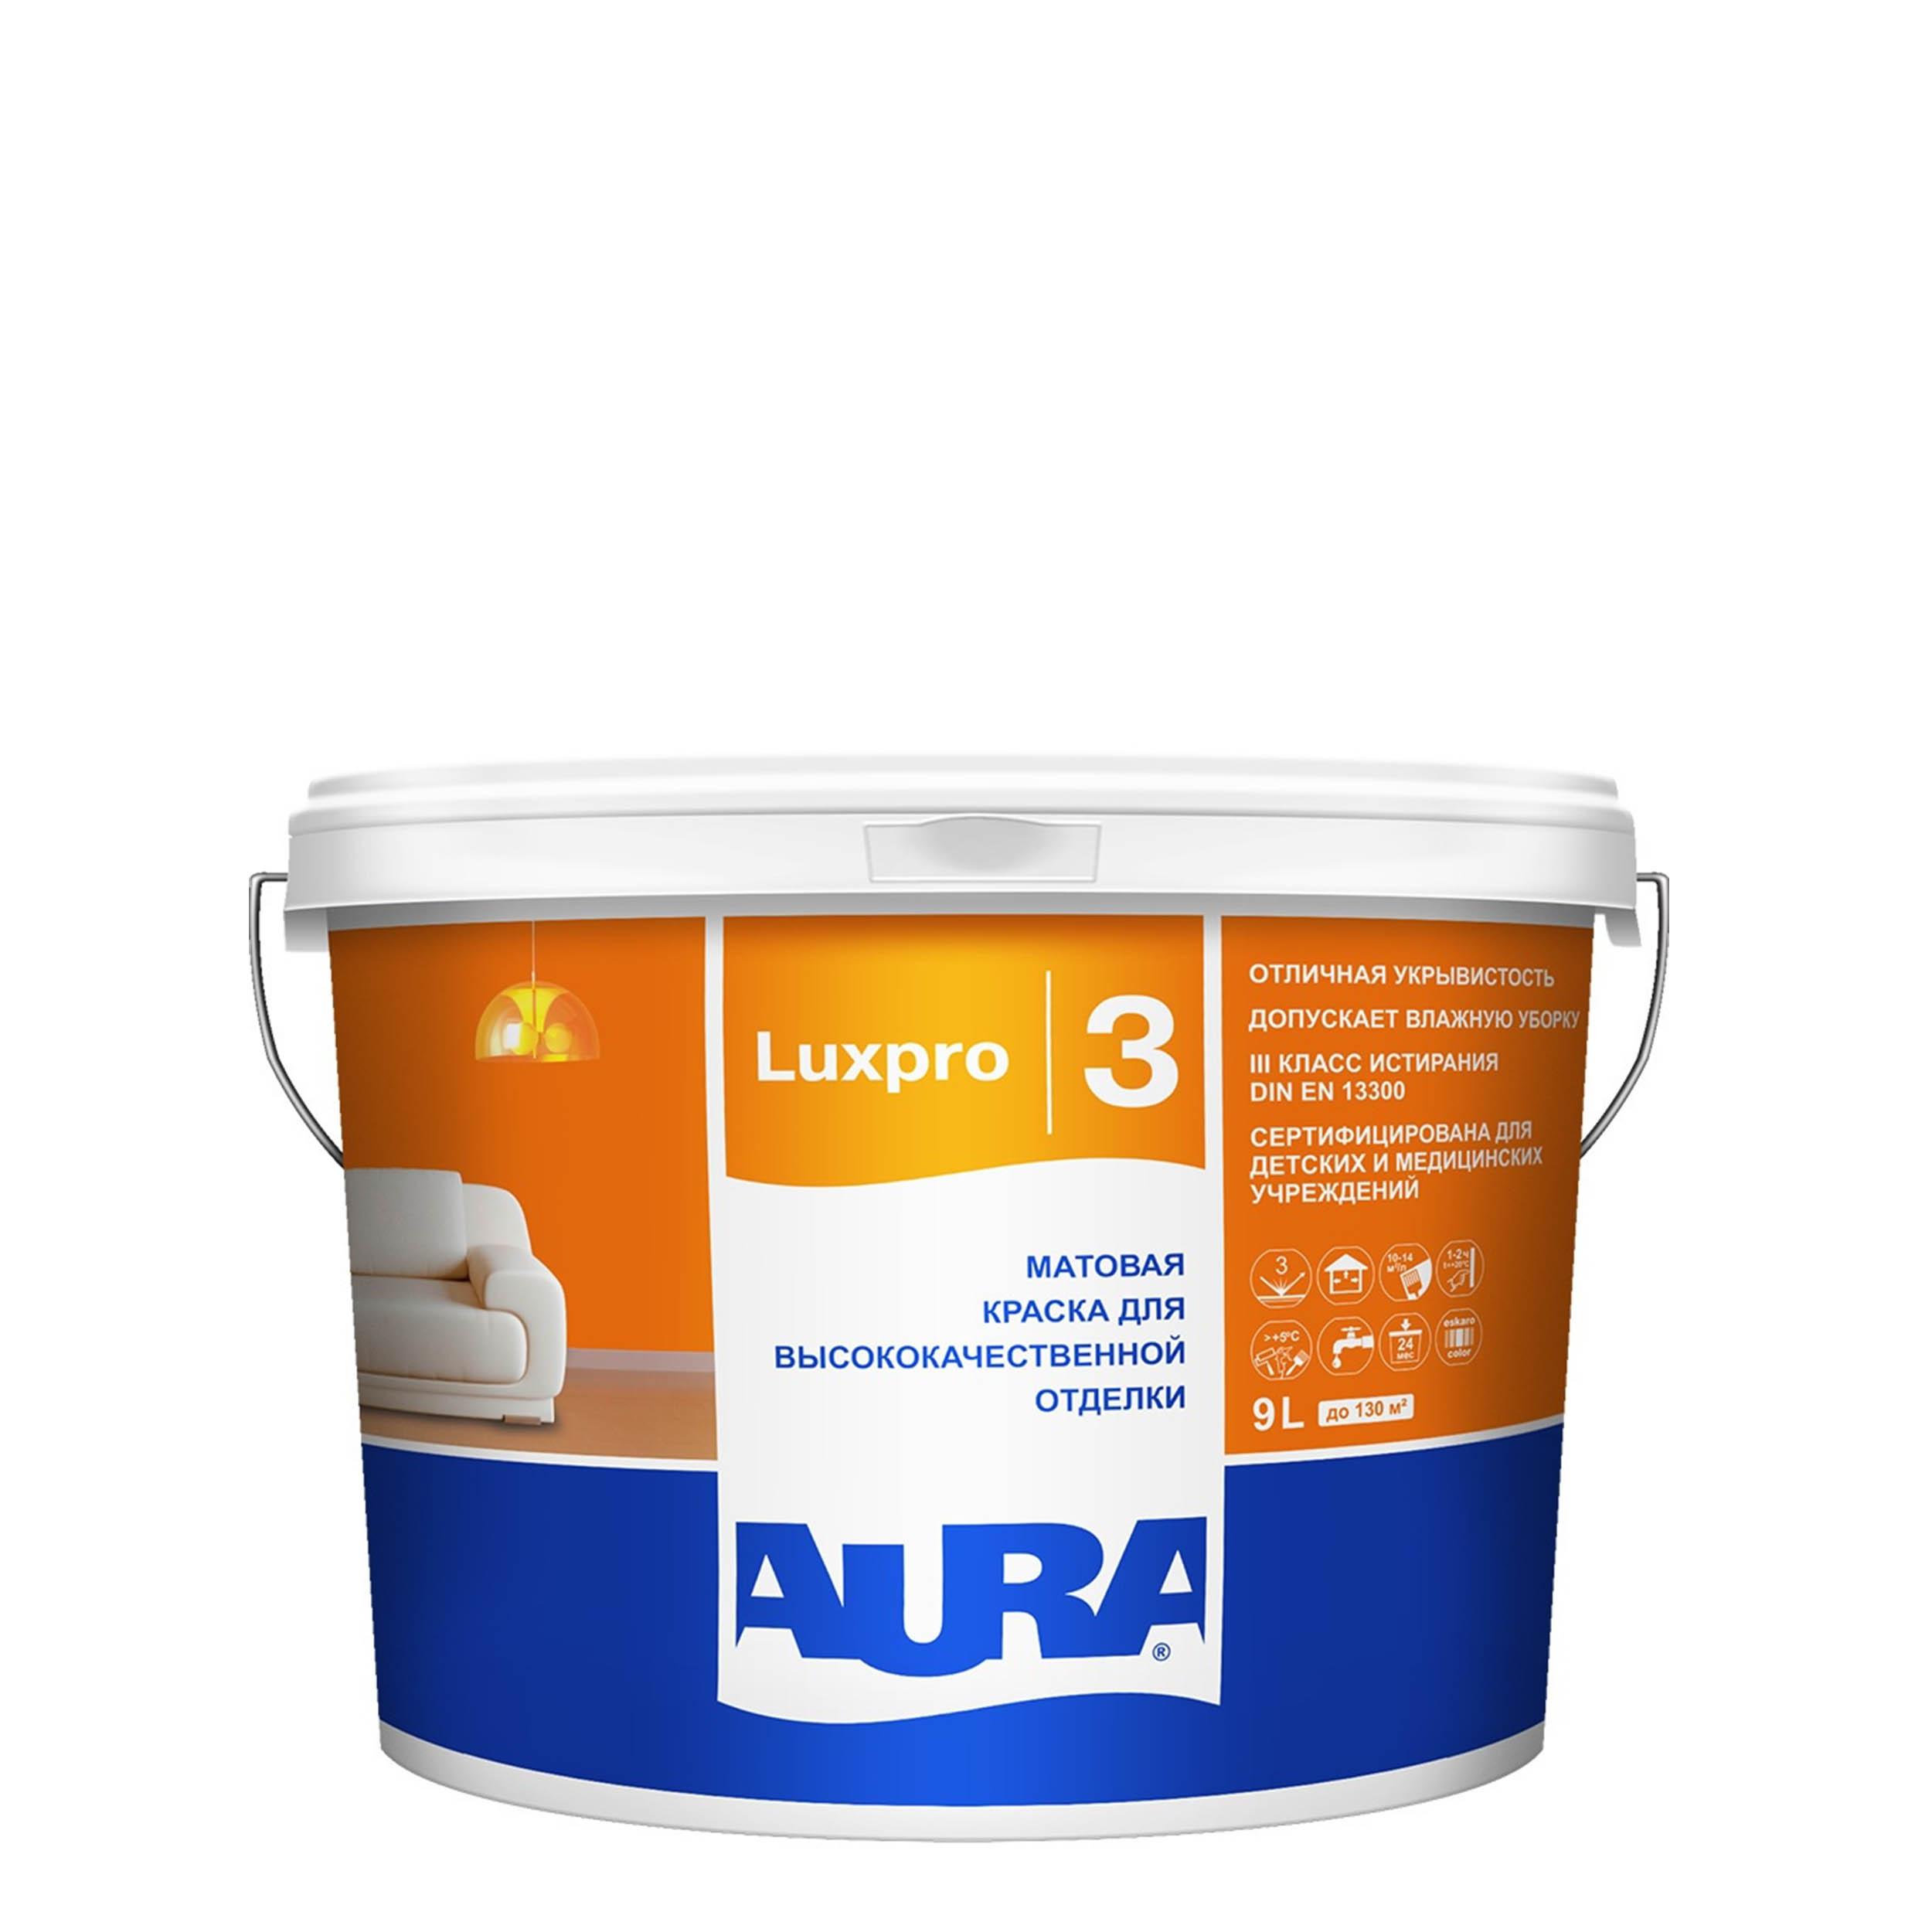 Фото 3 - Краска интерьерная, Aura LuxPRO 3, RAL 6016, 11 кг.